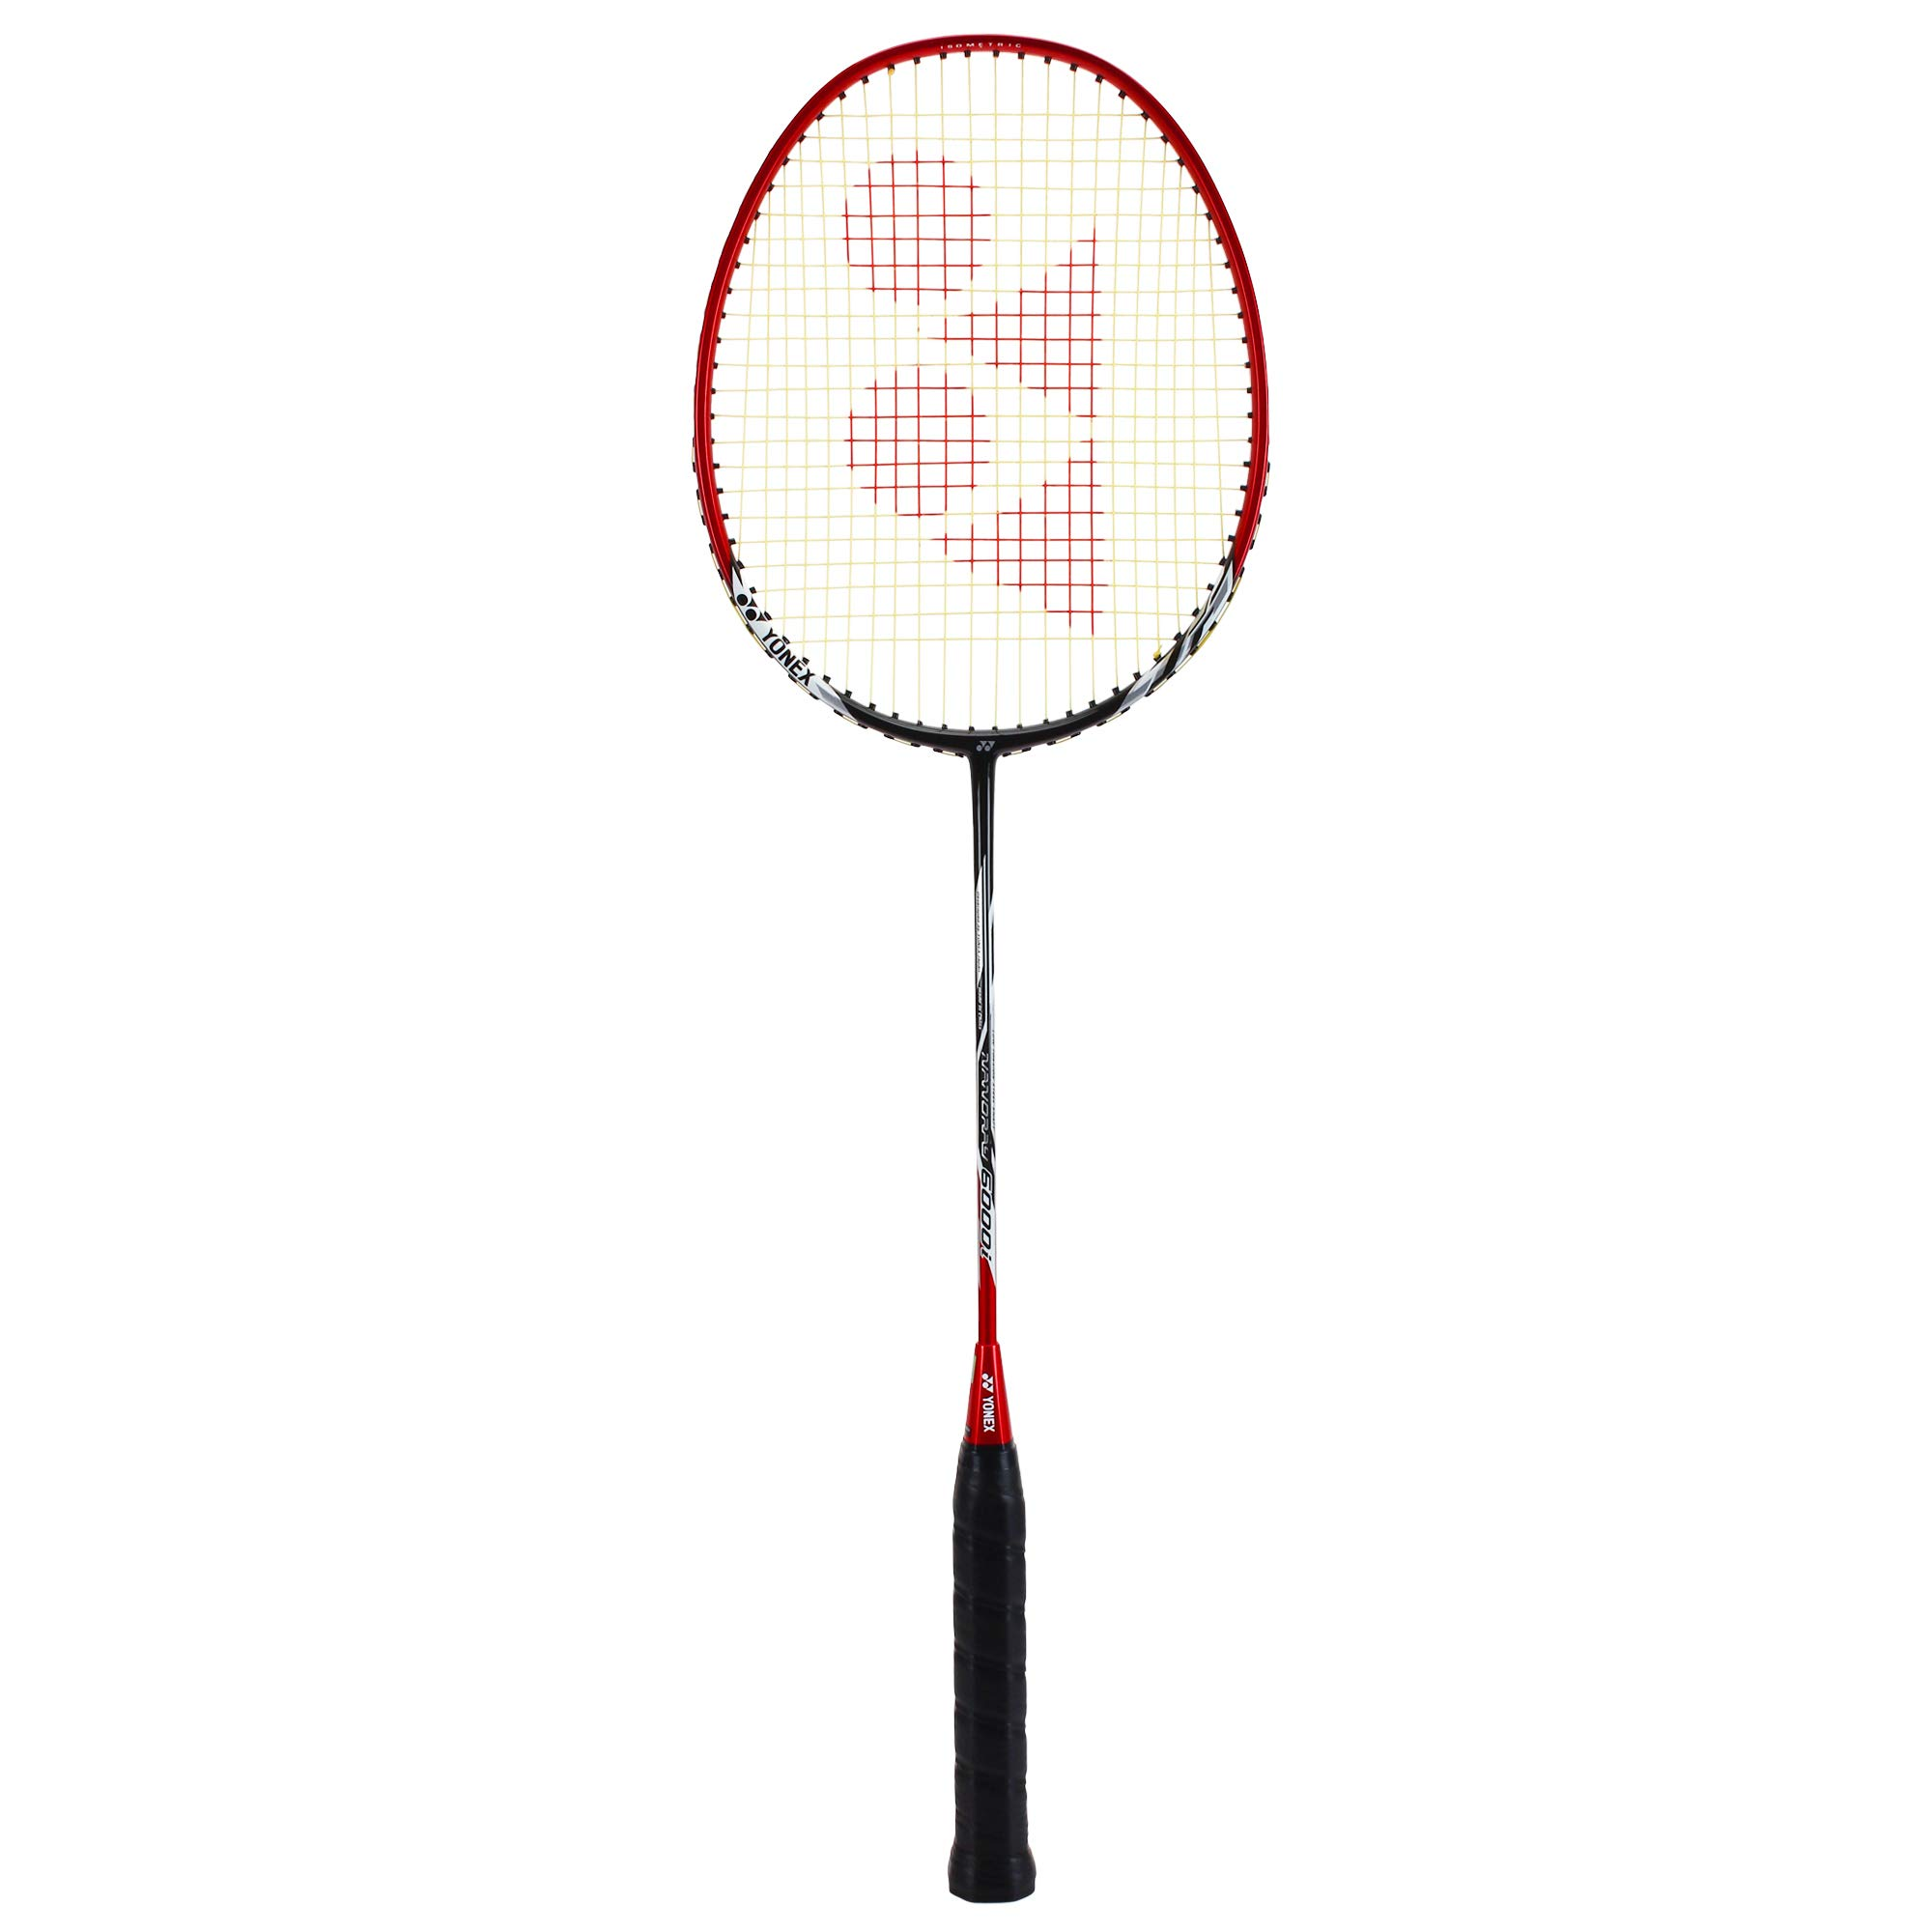 Yonex Nanoray 6000I G4-U Badminton Racquet Red by Yonex (Image #8)